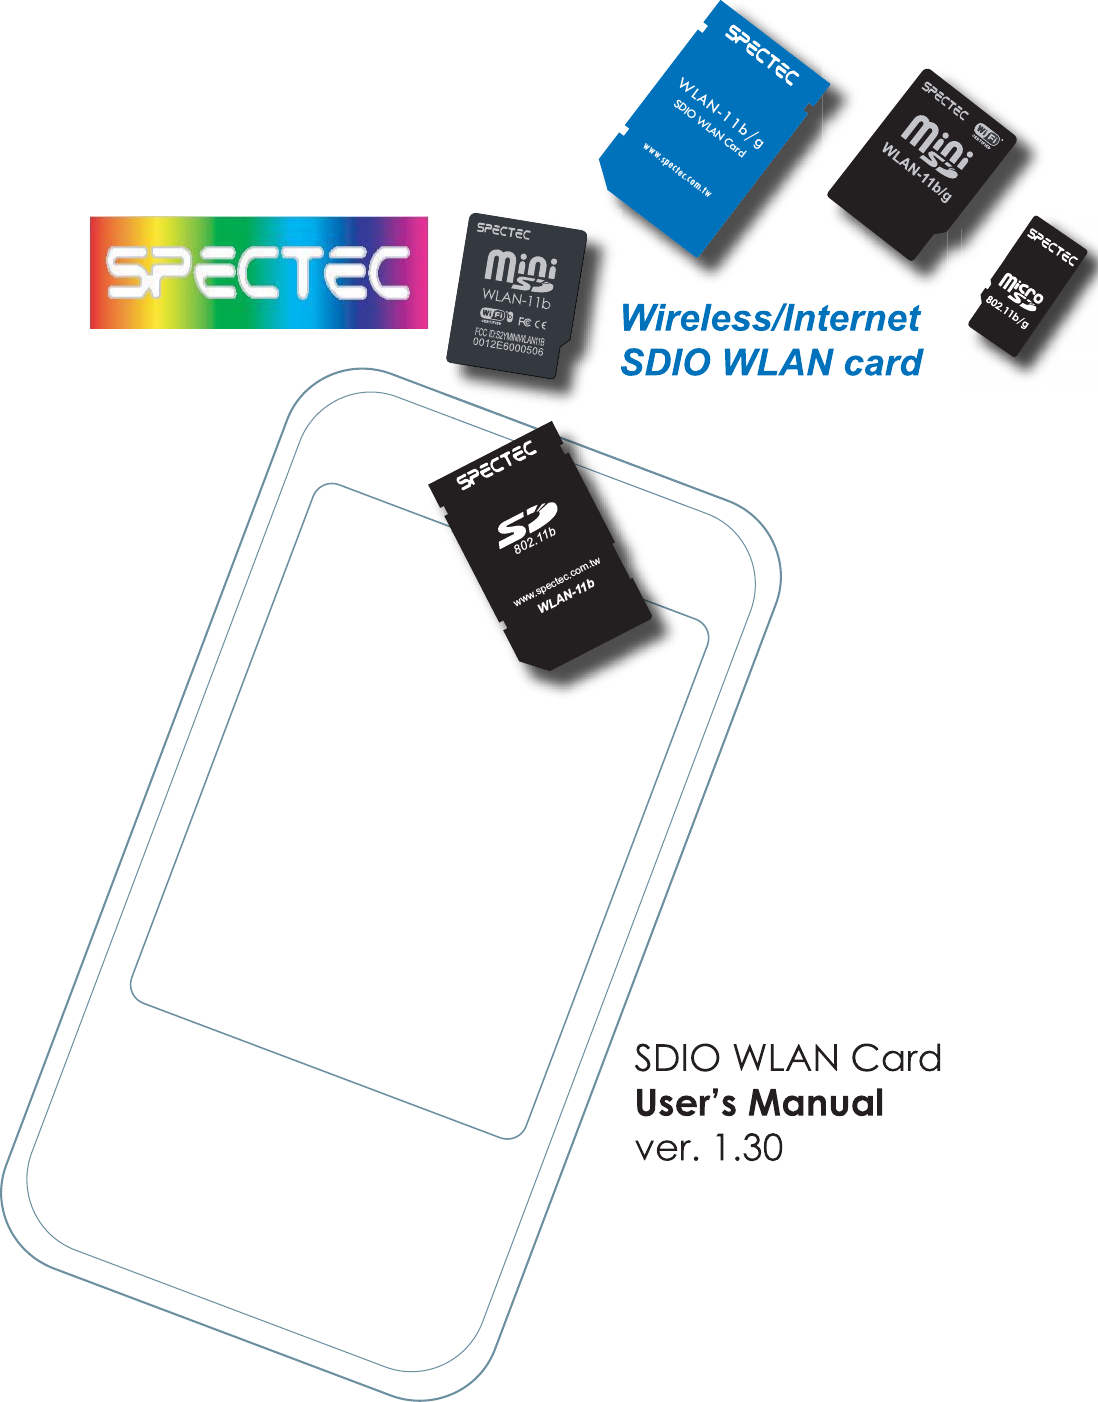 SPECTEC SDIO WLAN CARD DOWNLOAD DRIVERS